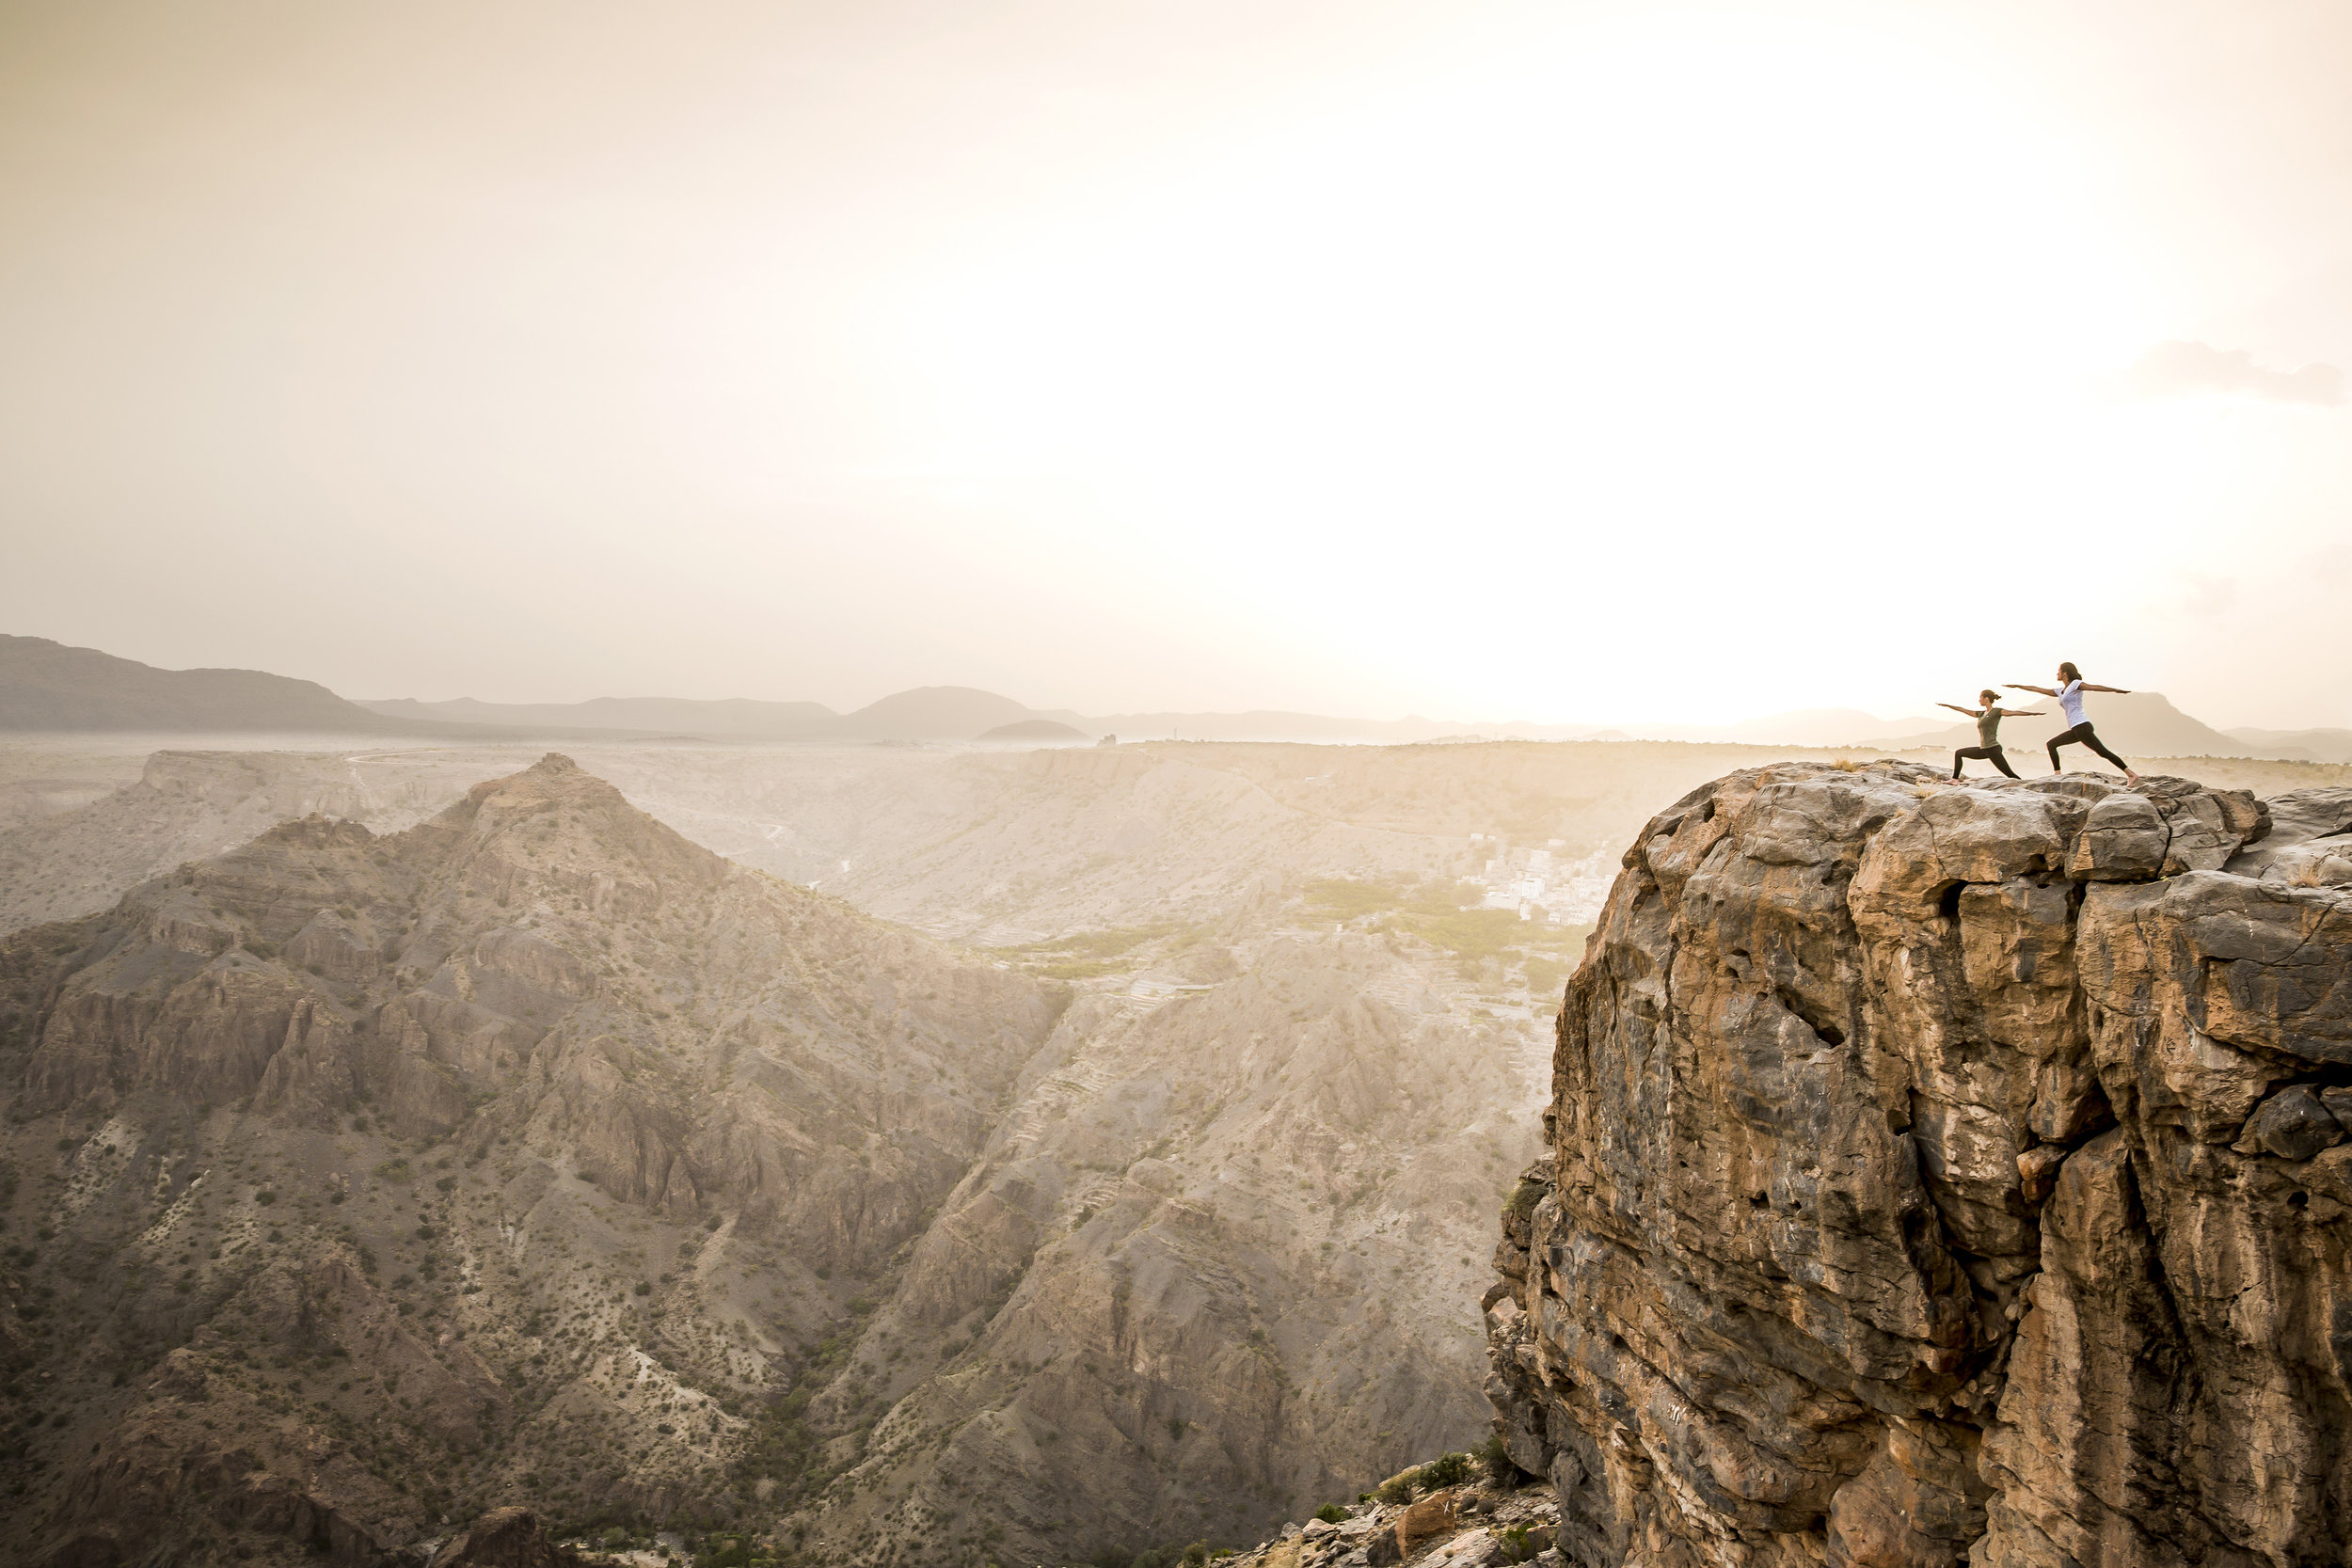 Anantara Al Jabal Al Akhdar Resort - Recreation - Yoga 01.jpg